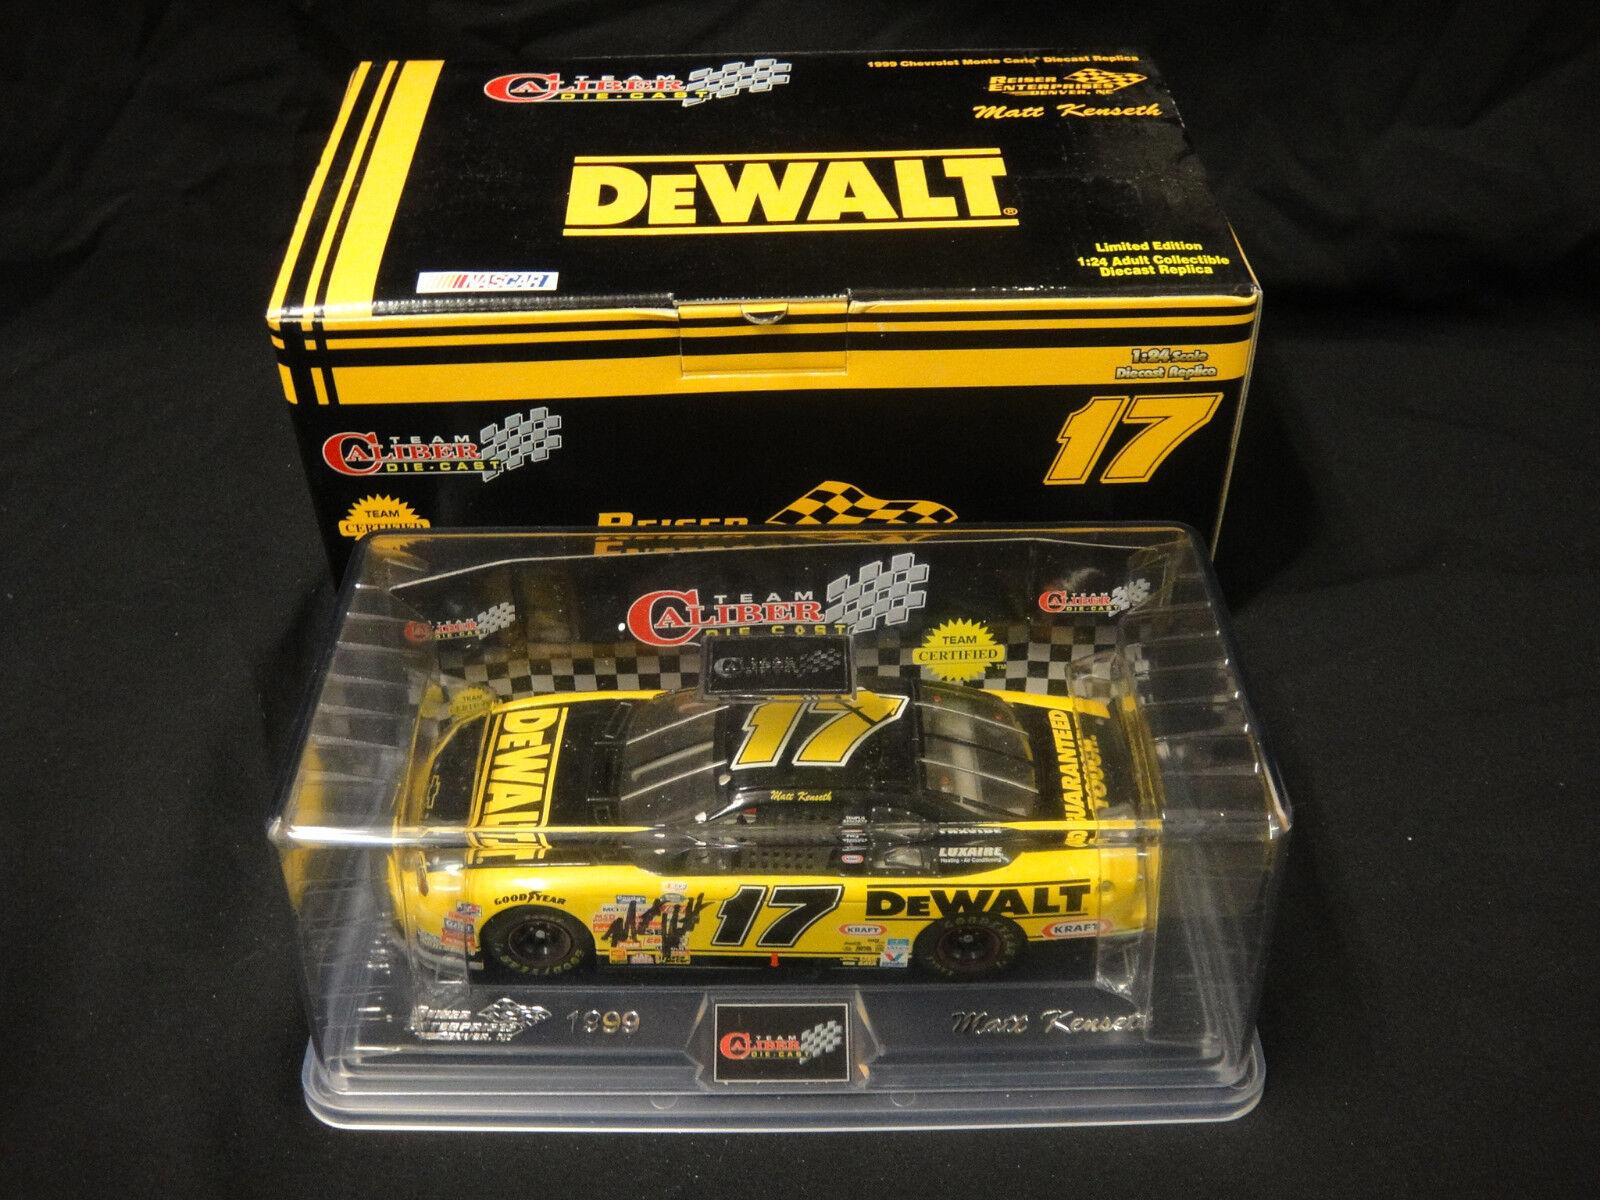 AUTOGRAPHED Team Caliber  17 Matt Kenseth 1999 DeWalt Racing 1 24 Scale DieCast